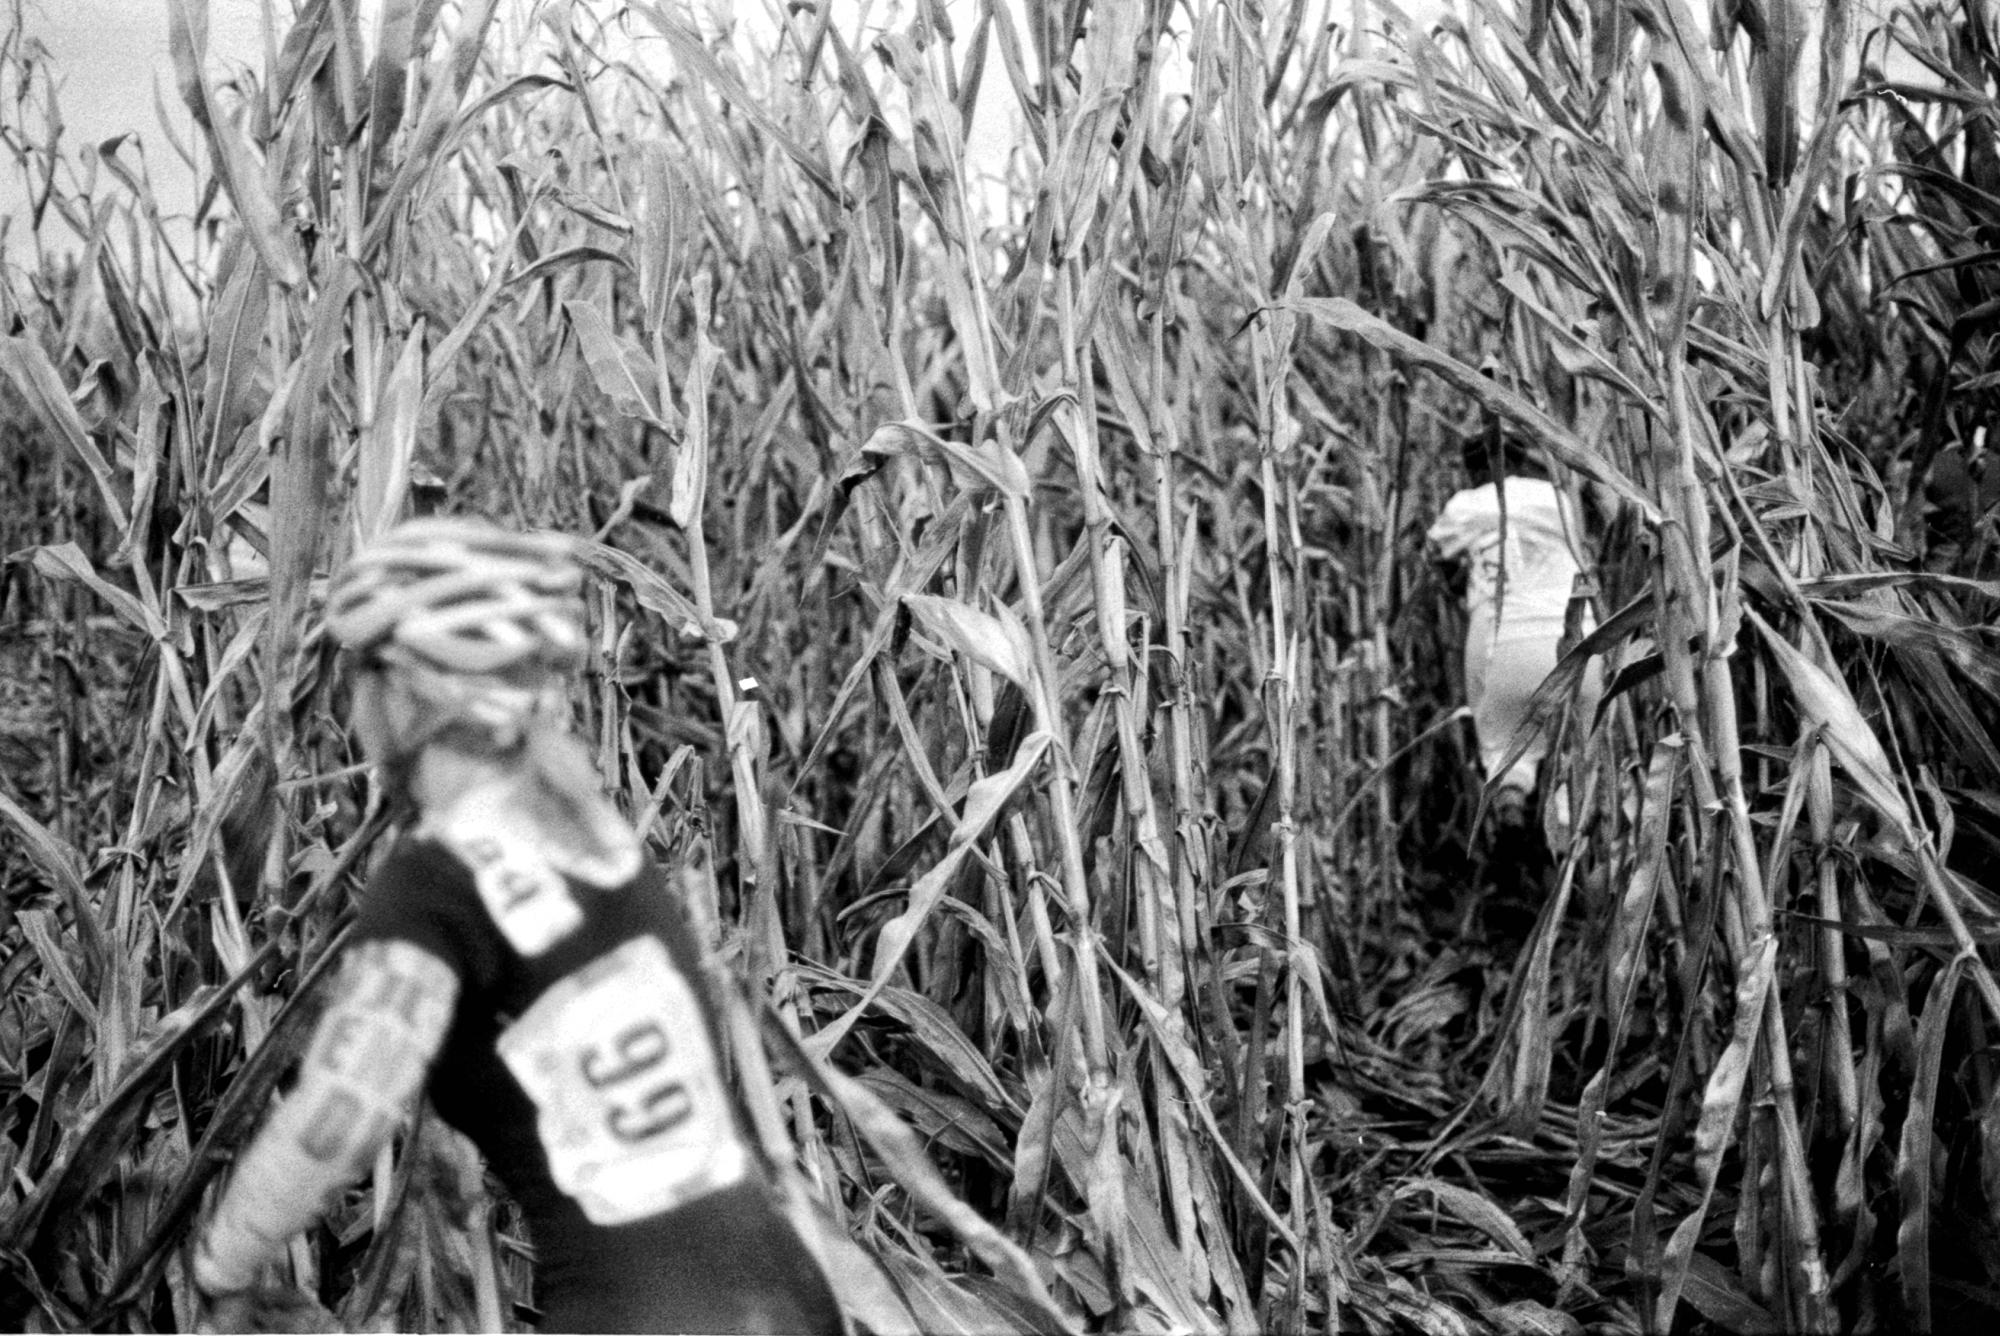 the-great-bike-hunt-damian-riehl-fauxriehl